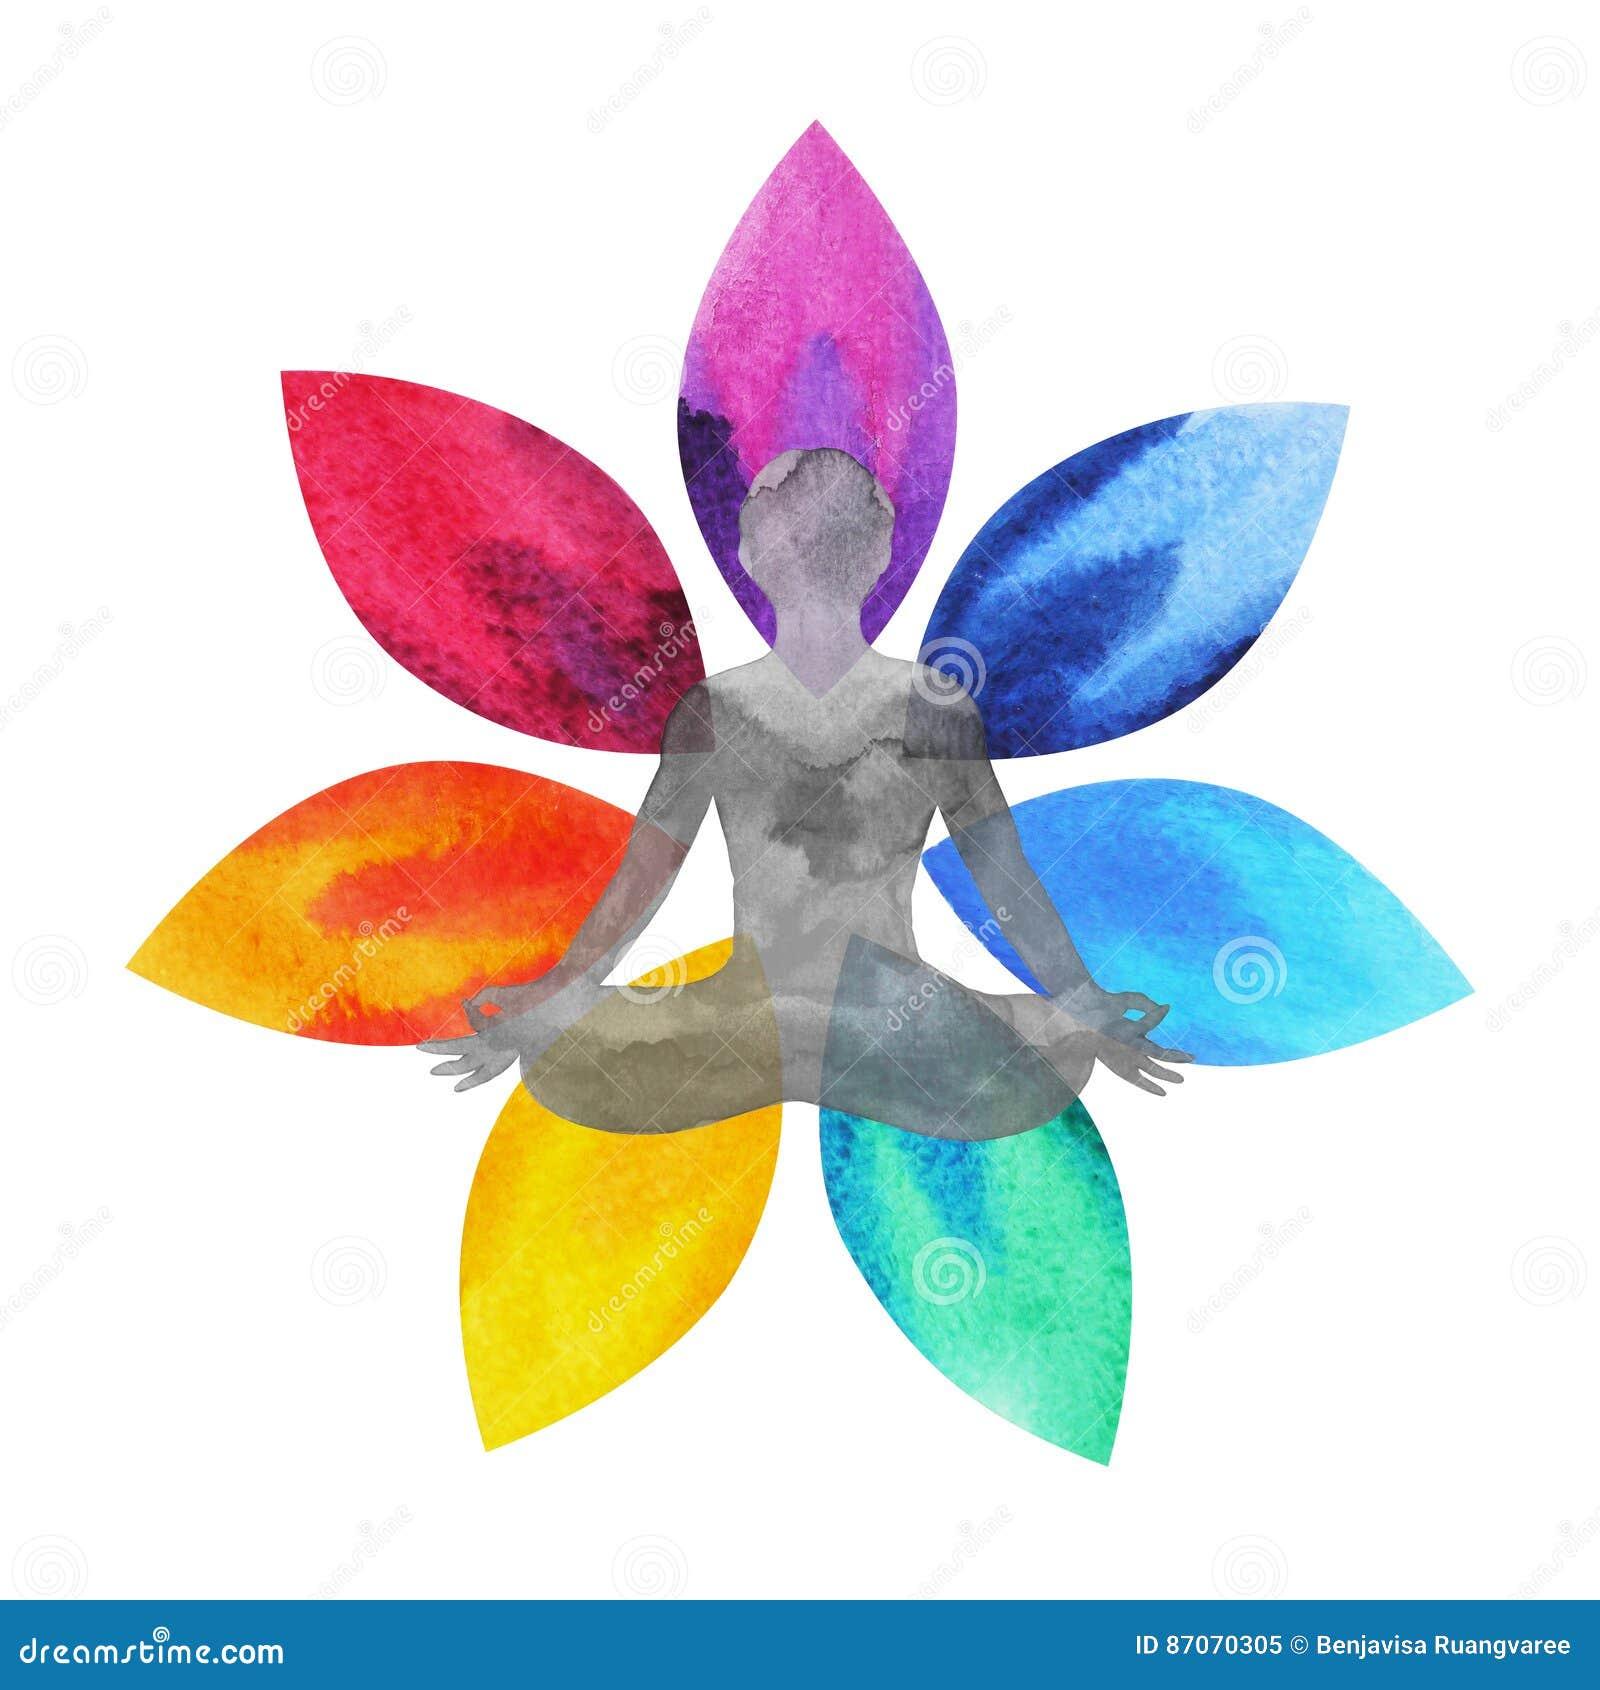 7 color of chakra symbol lotus flower with human body watercolor download 7 color of chakra symbol lotus flower with human body watercolor painting stock izmirmasajfo